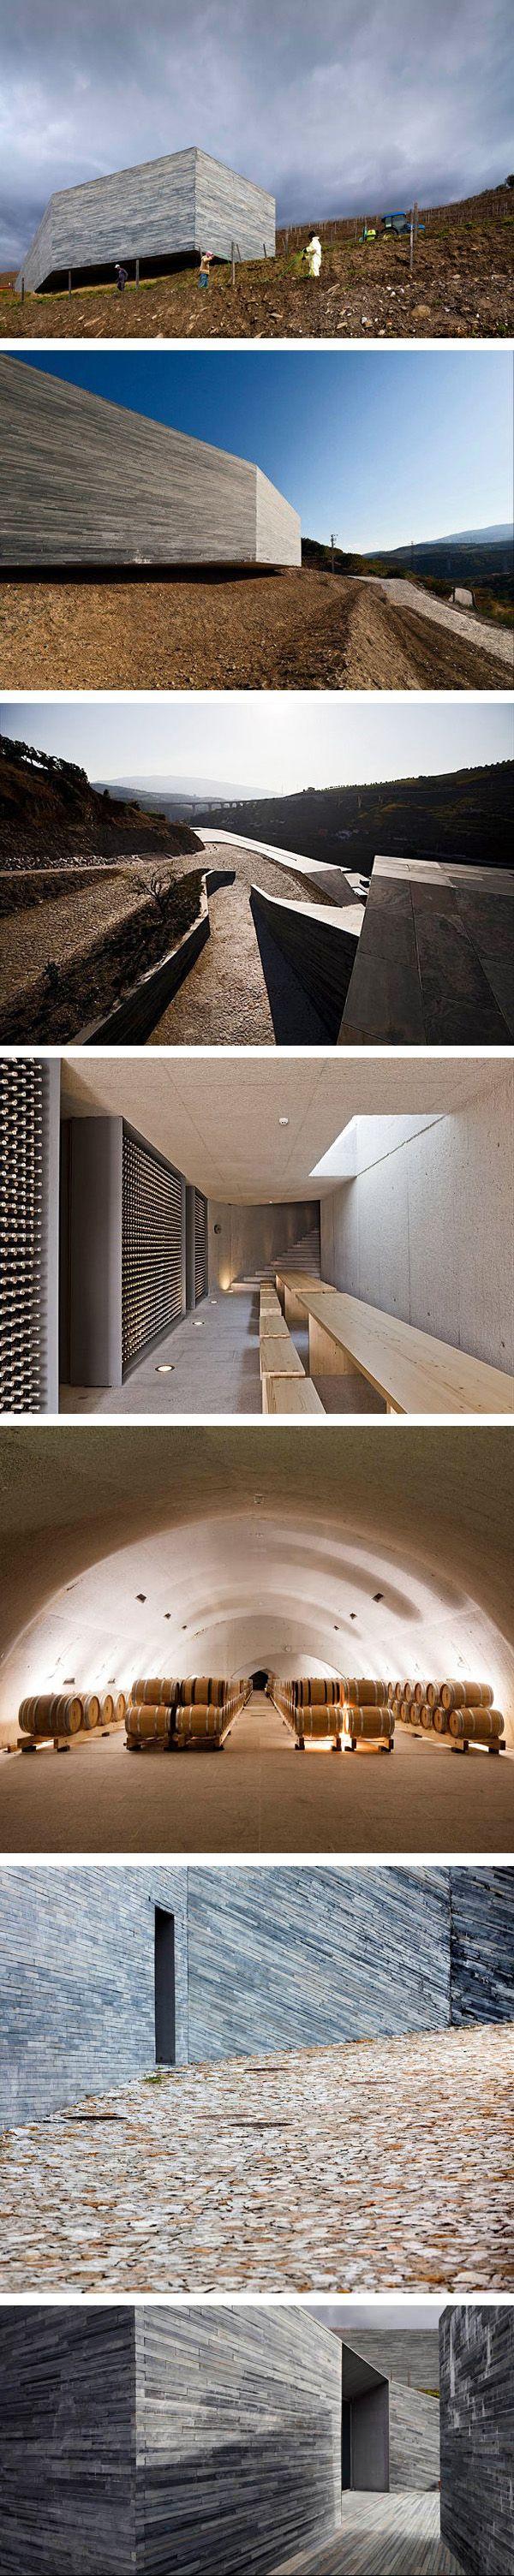 Superb use of materials and volume in Bodega Quinta Do Vallado, Portugal